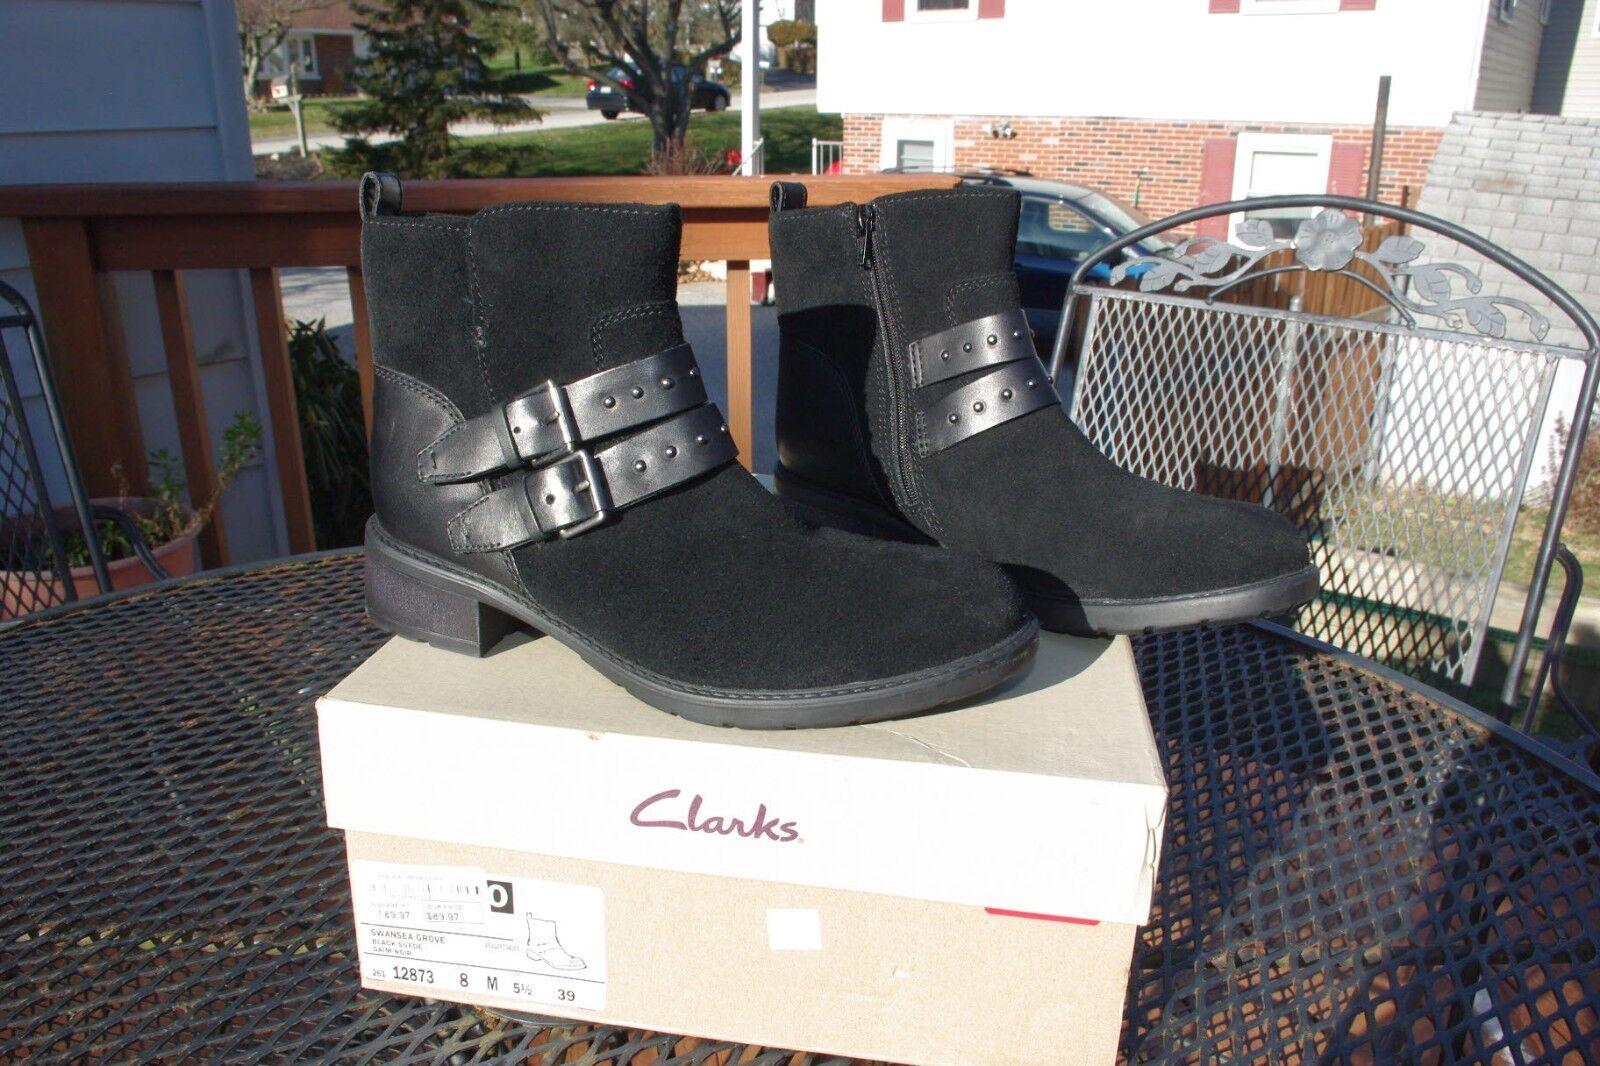 NIB Clark's Ladies Swansea Grove Black Leather & Suede Ankle Boots Booties 8 M